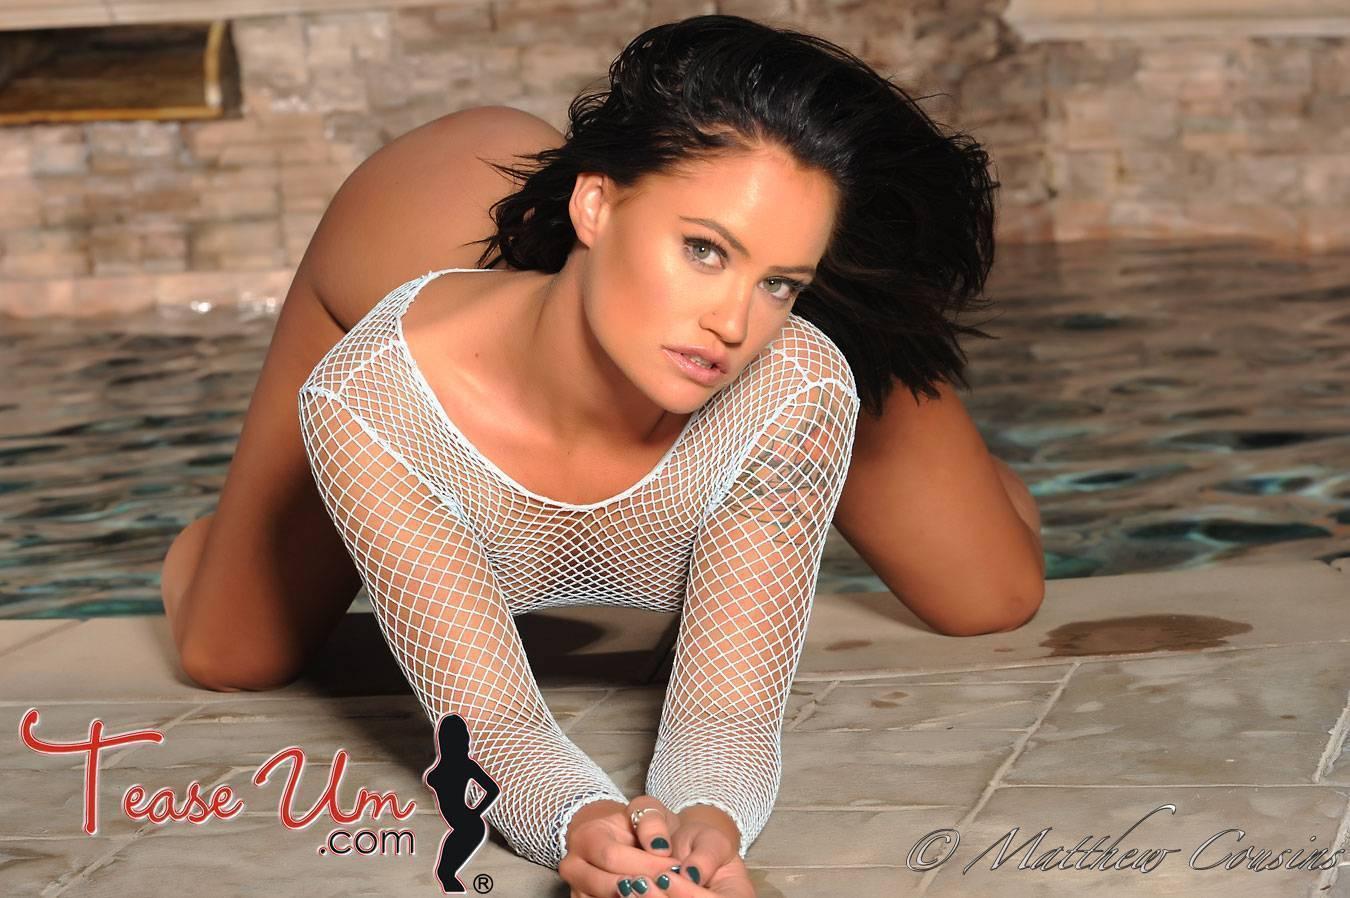 Olivia Chambers hot model in white mesh top thumb 1